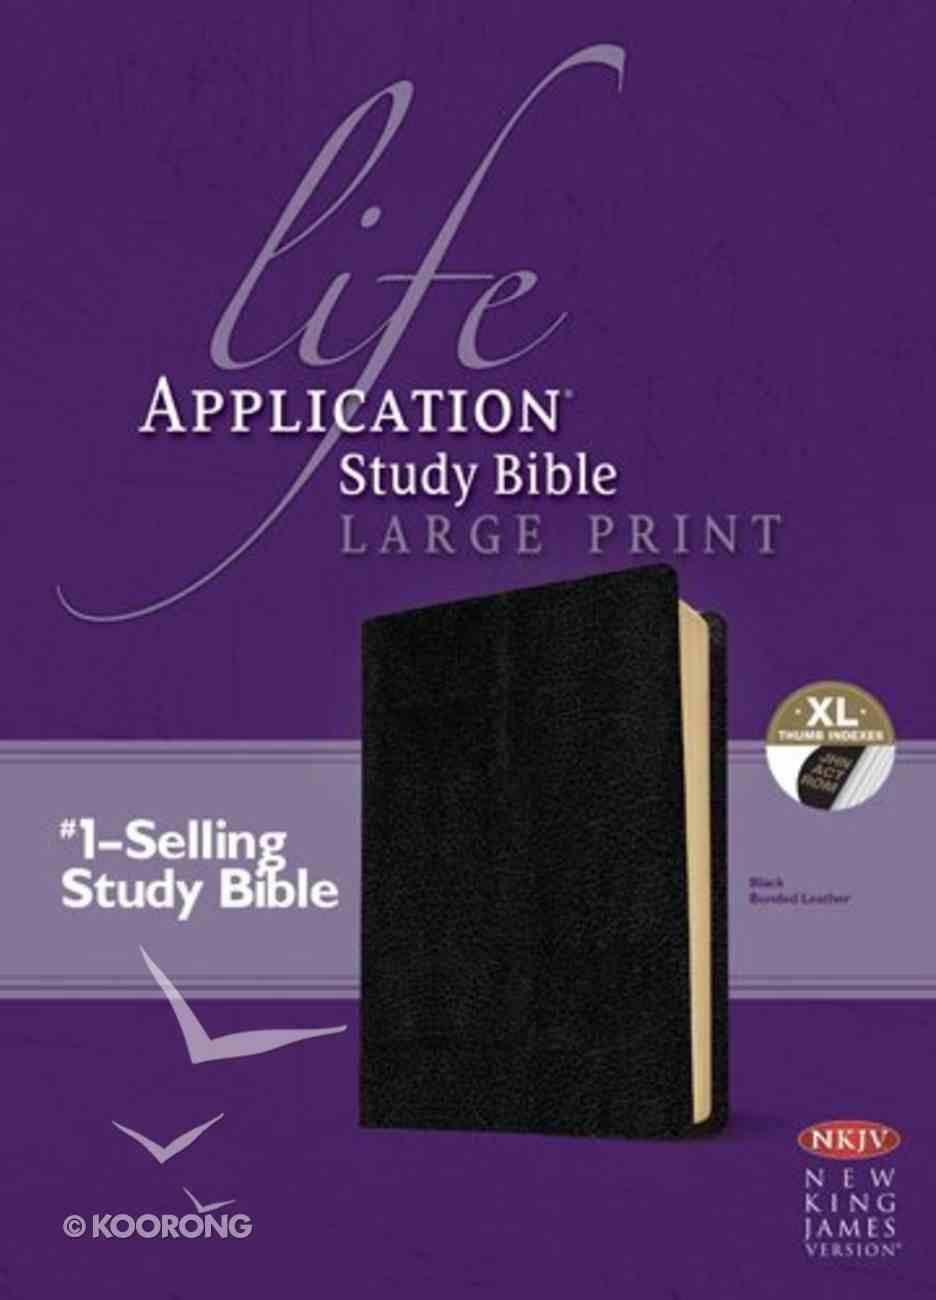 NKJV Life Application Study Bible Large Print Indexed Black (Red Letter Edition) Bonded Leather